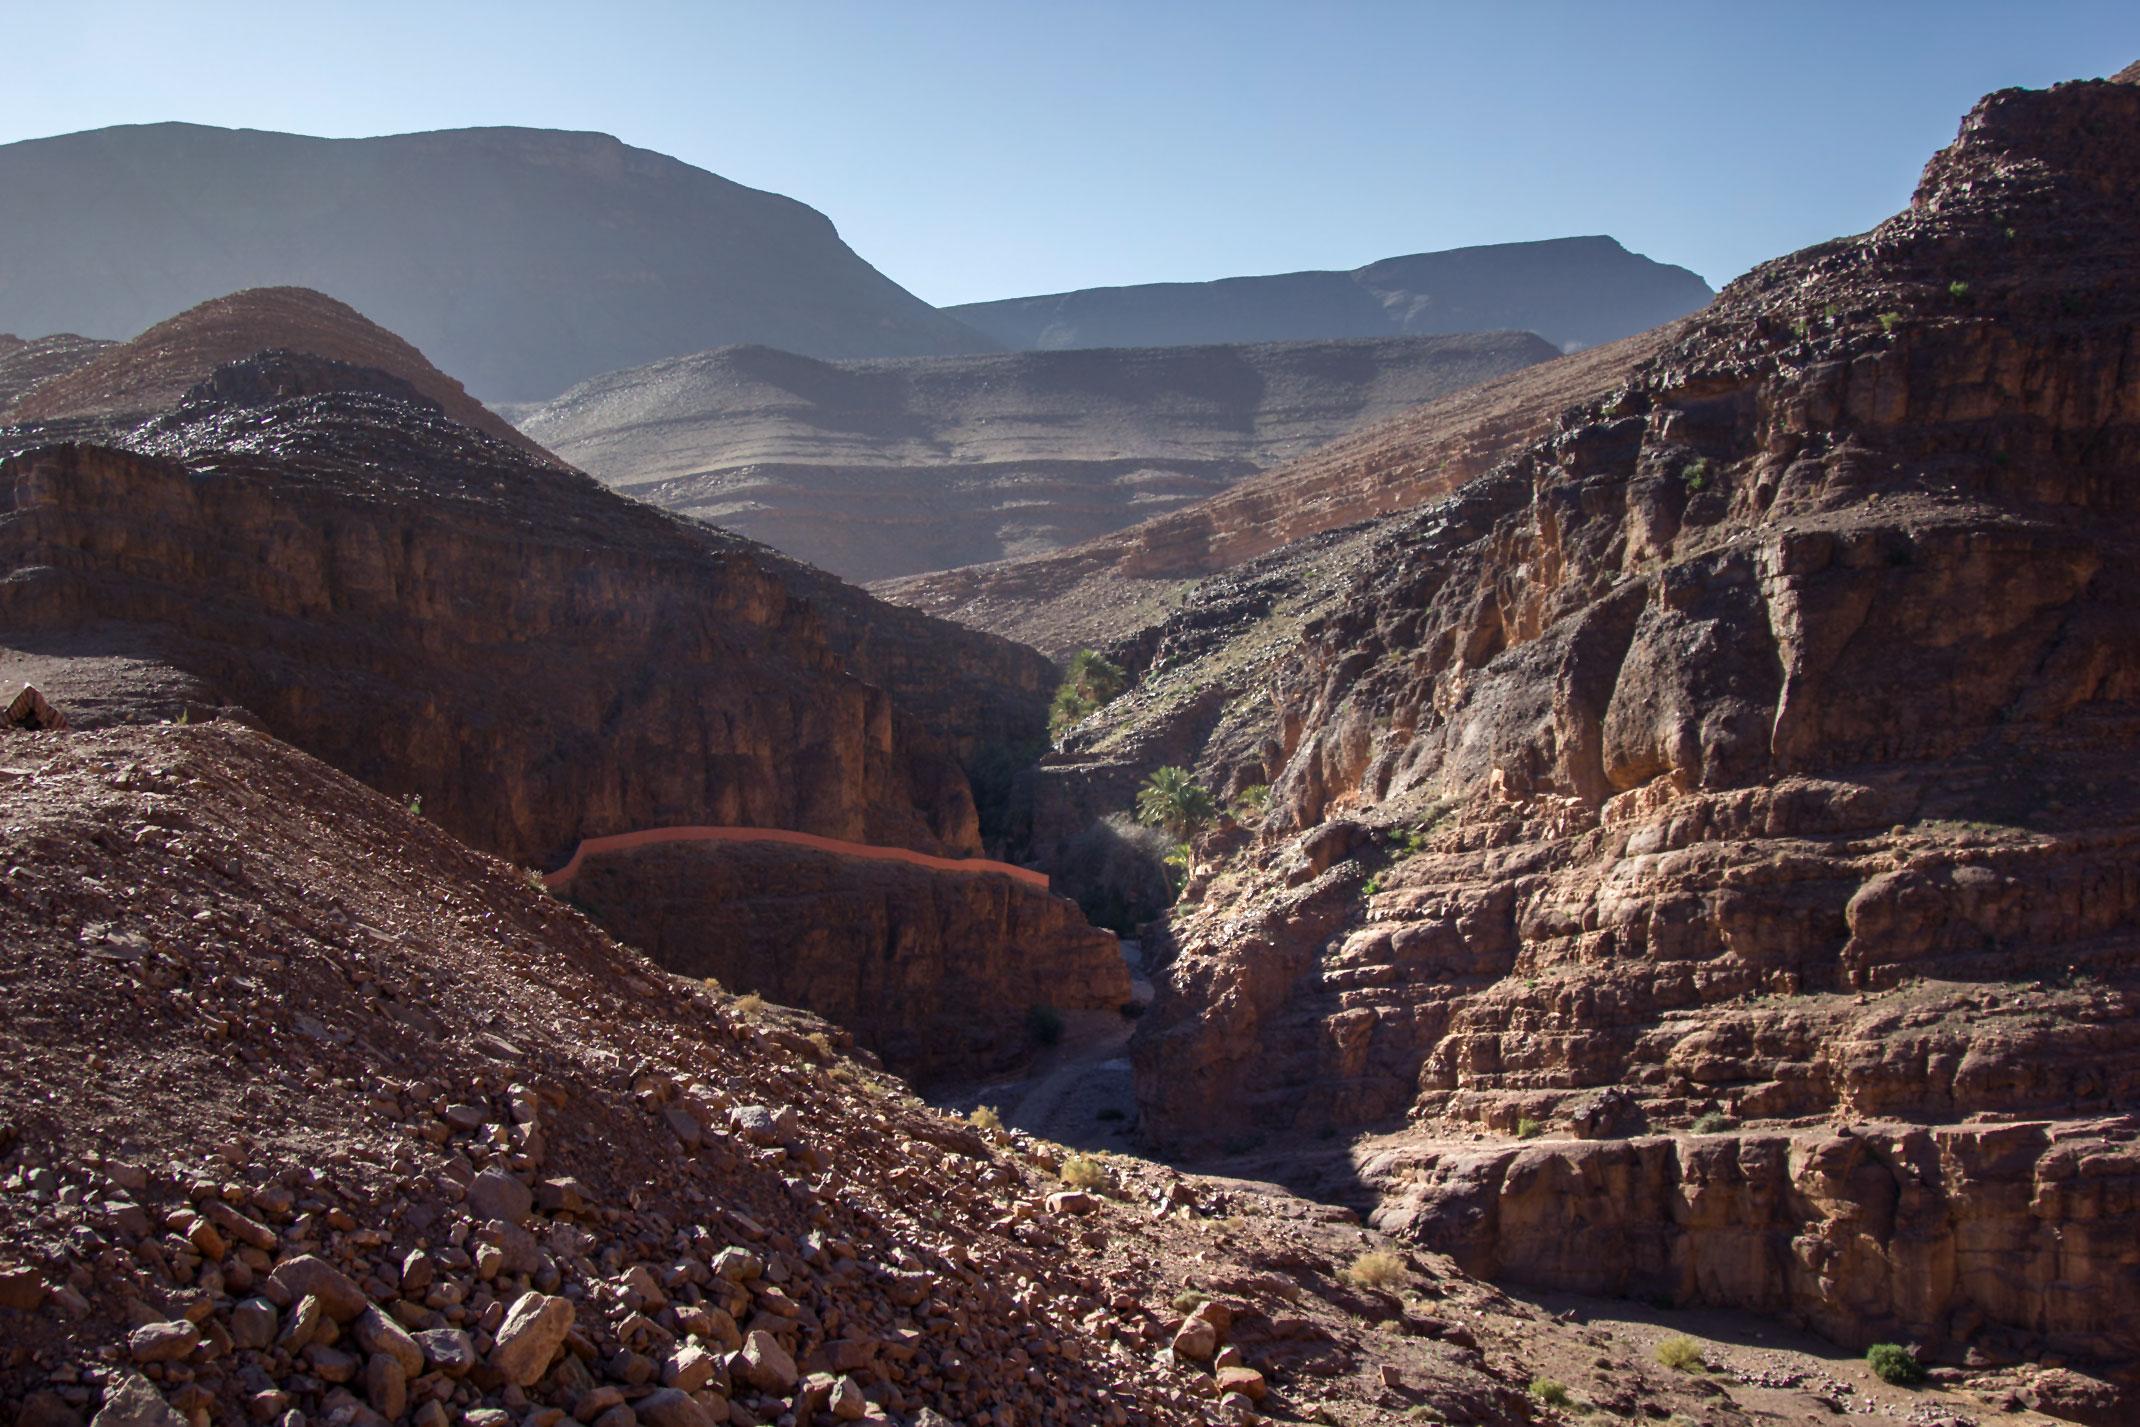 Les cascades de Tizgui